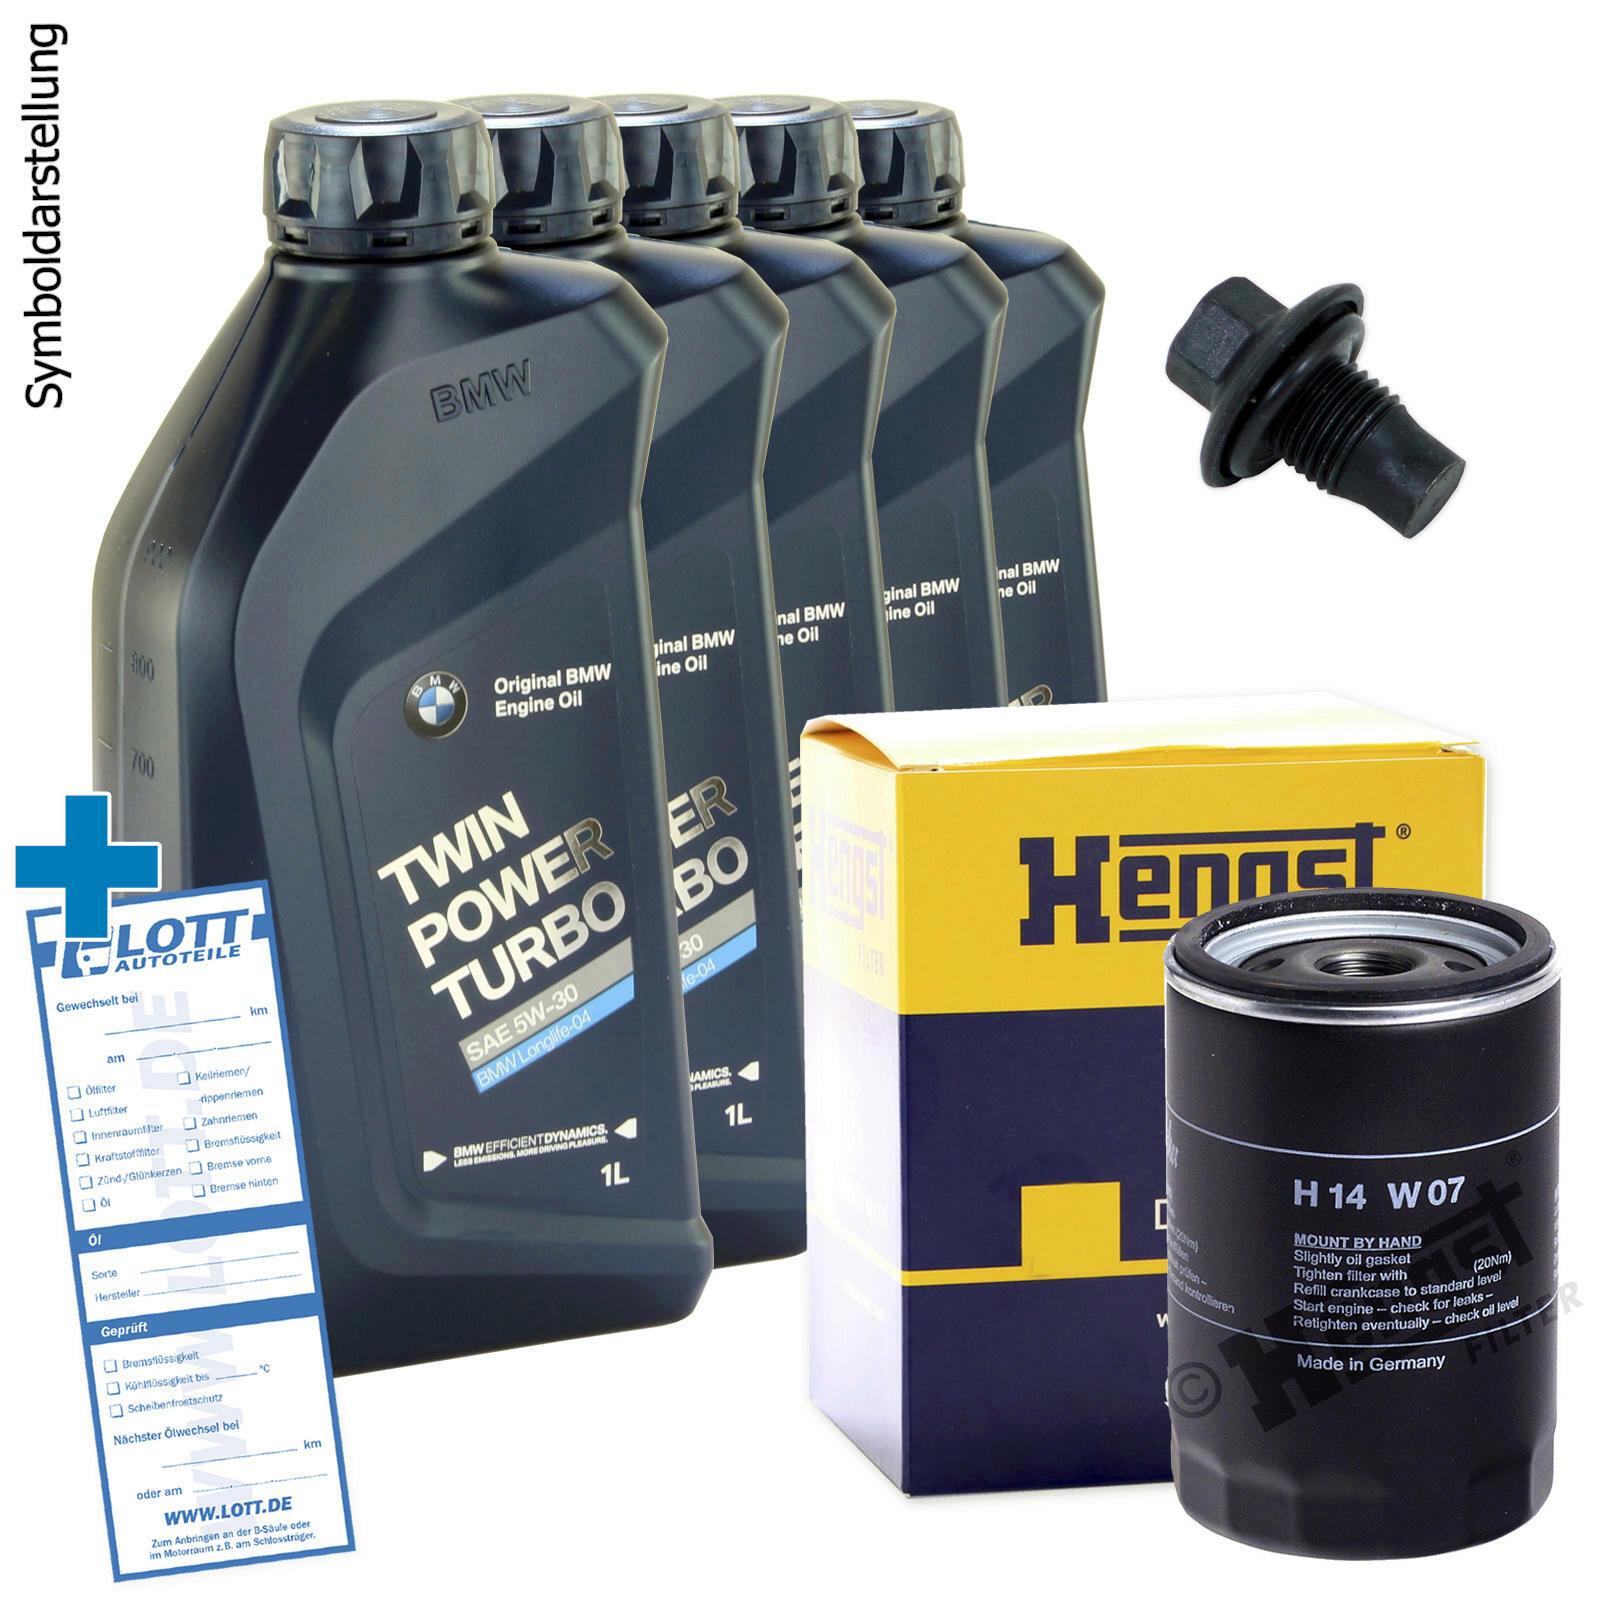 Ölwechsel Set 5L 5W-30 BMW Motoröl + Hengst Ölfilter + Ablassschraube